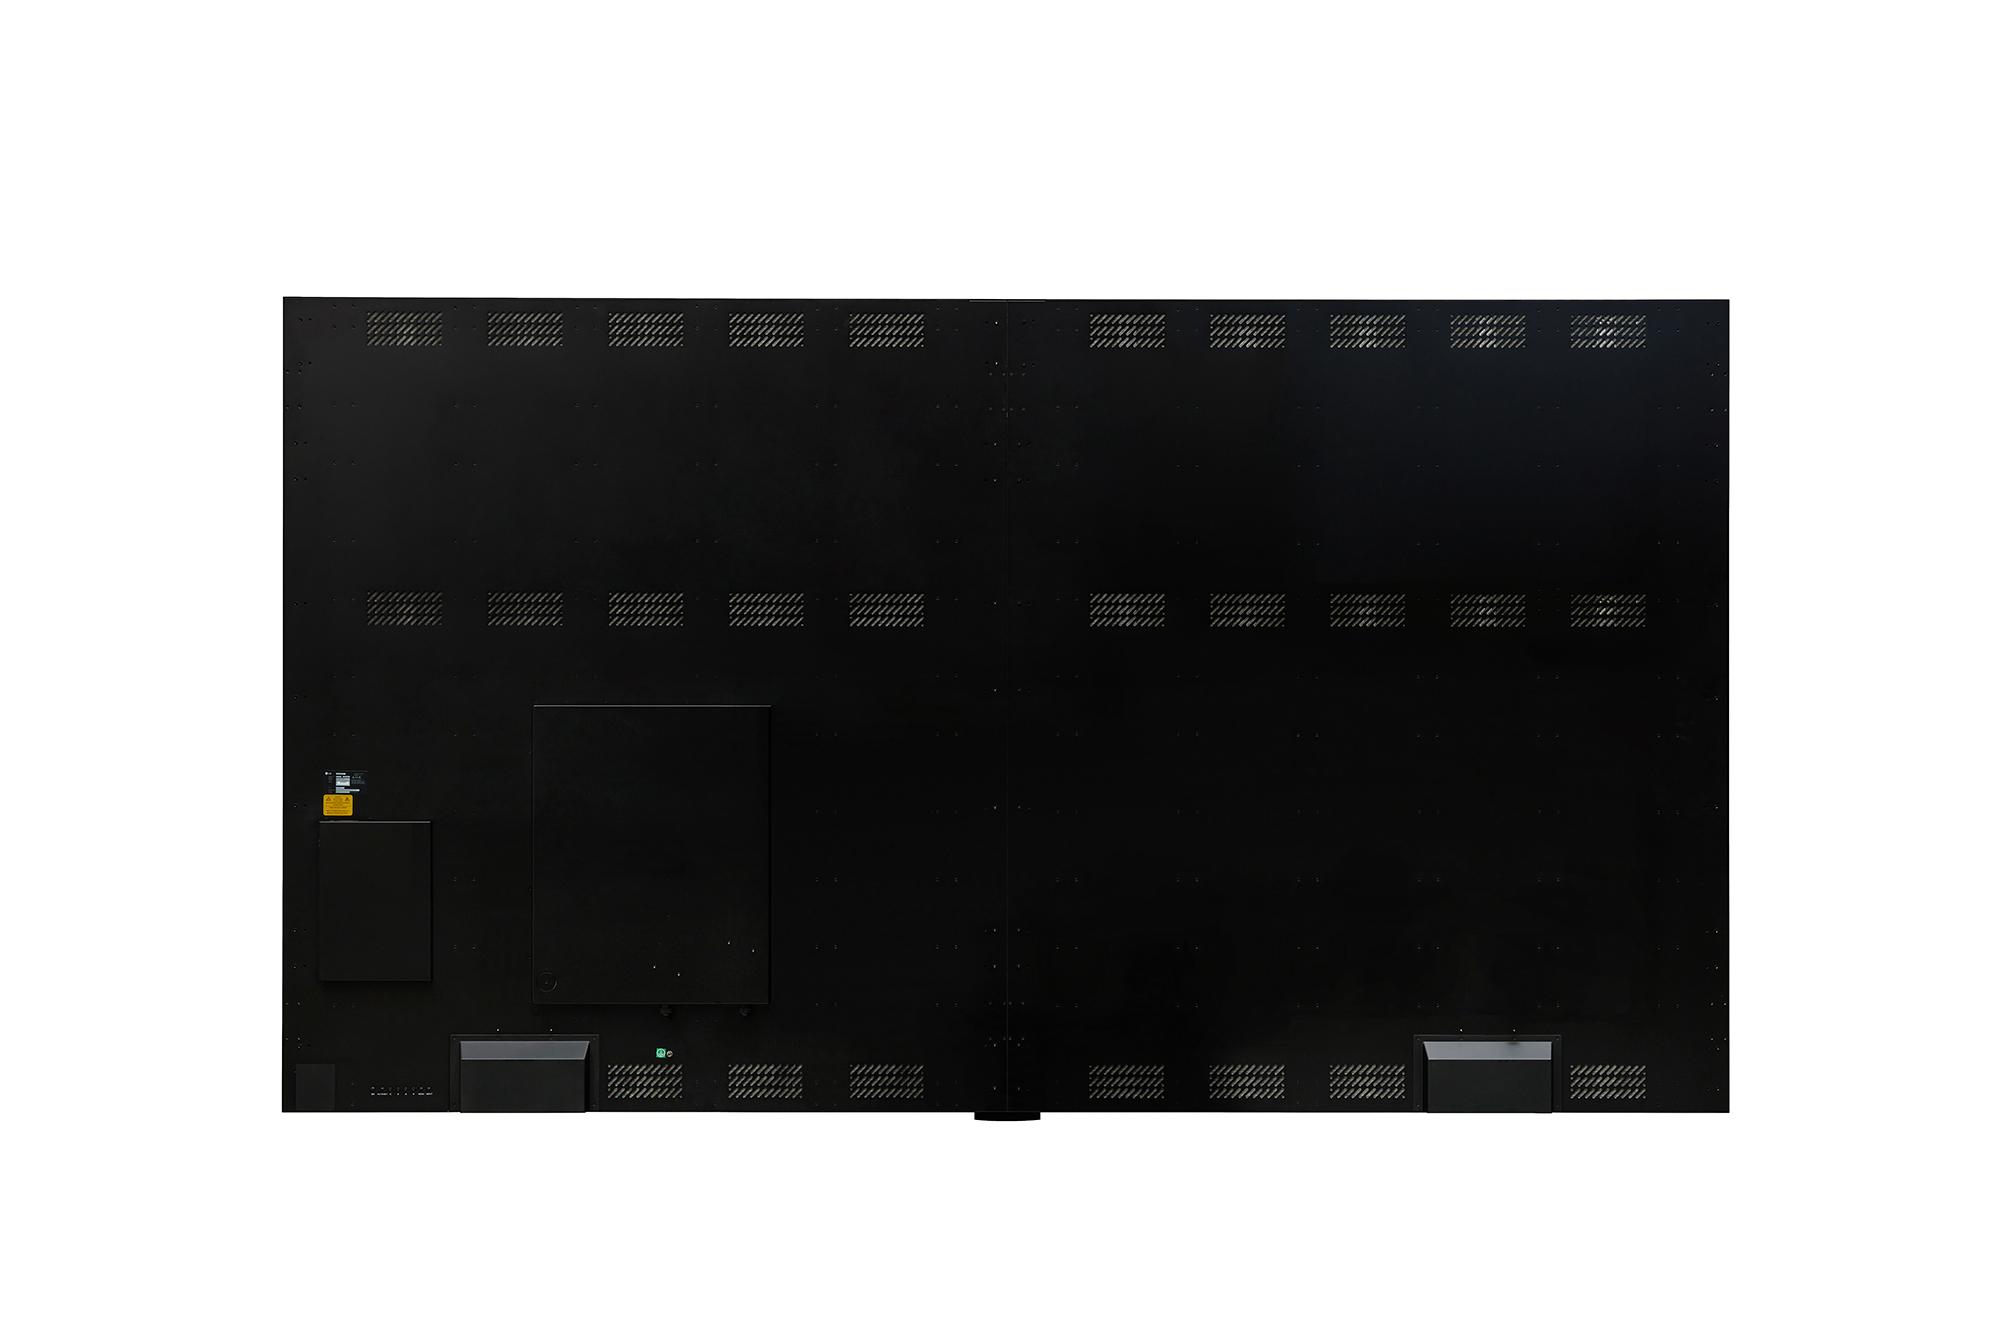 LED Signage LAEC015, Rear view